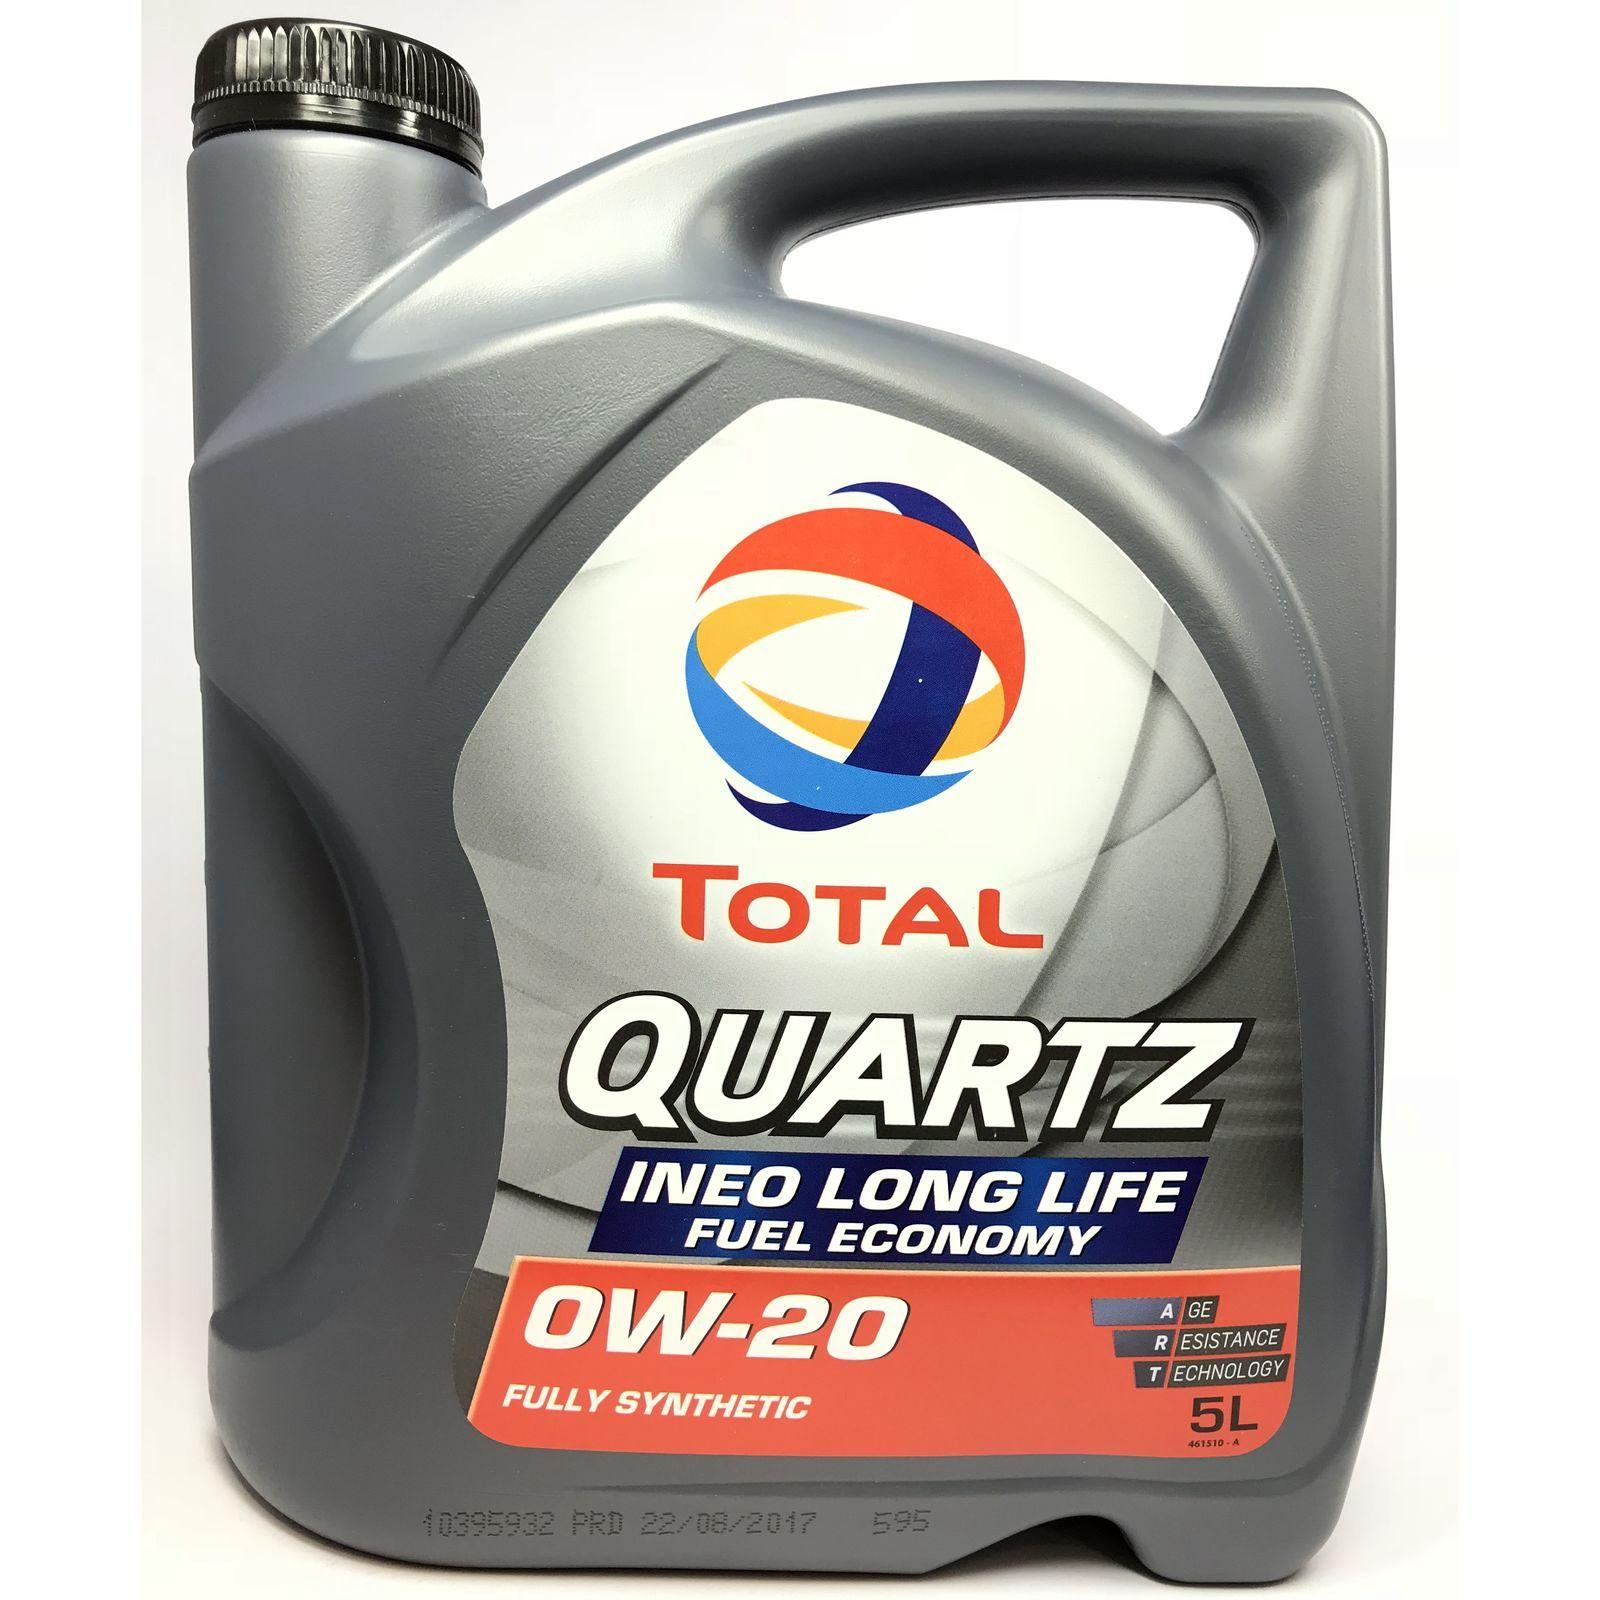 5 Liter Total Quartz Ineo LongLife 0W-20